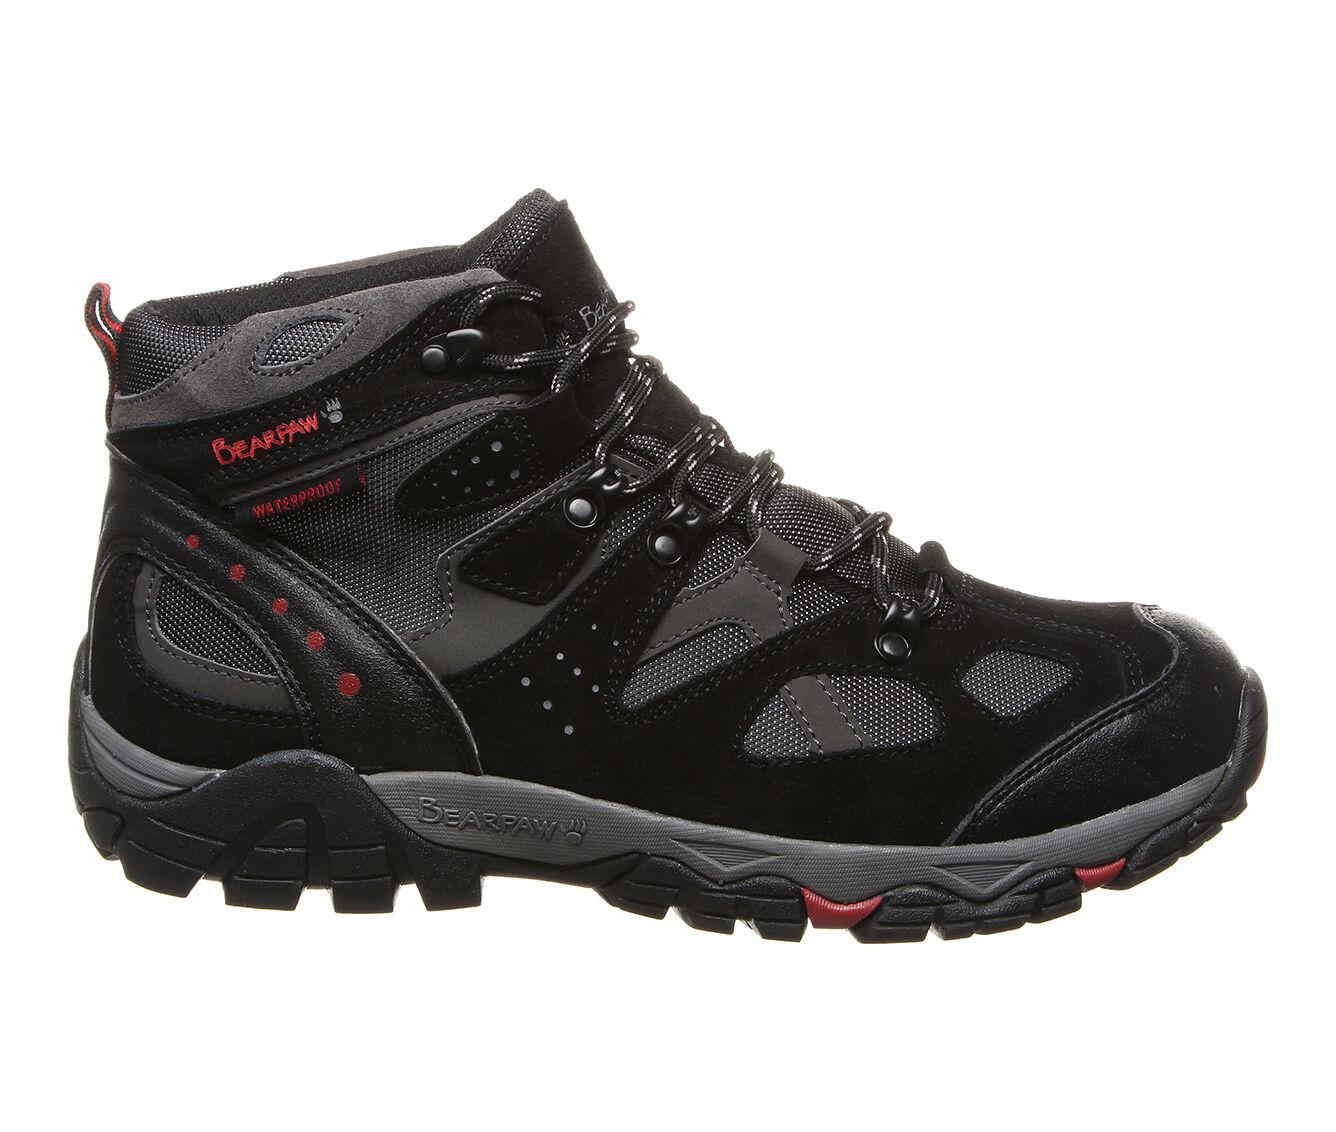 Men's Bearpaw Brock Hiking Boots Black/Grey